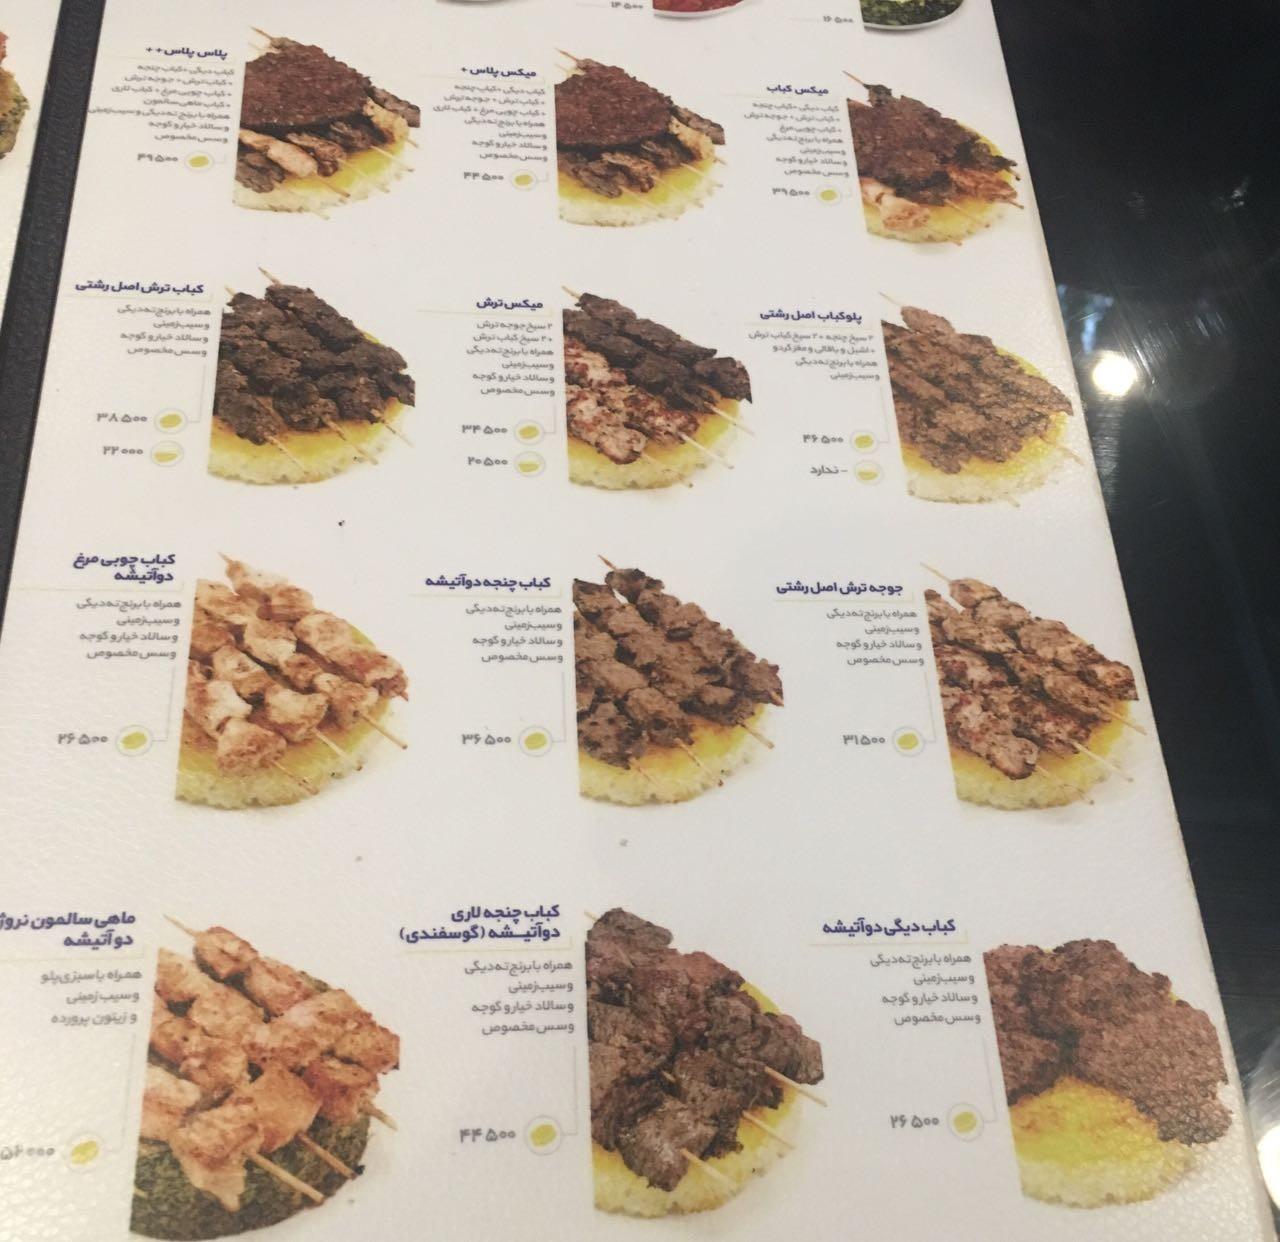 tah-dig-restaurant-tehran-8f2dfd4644beee